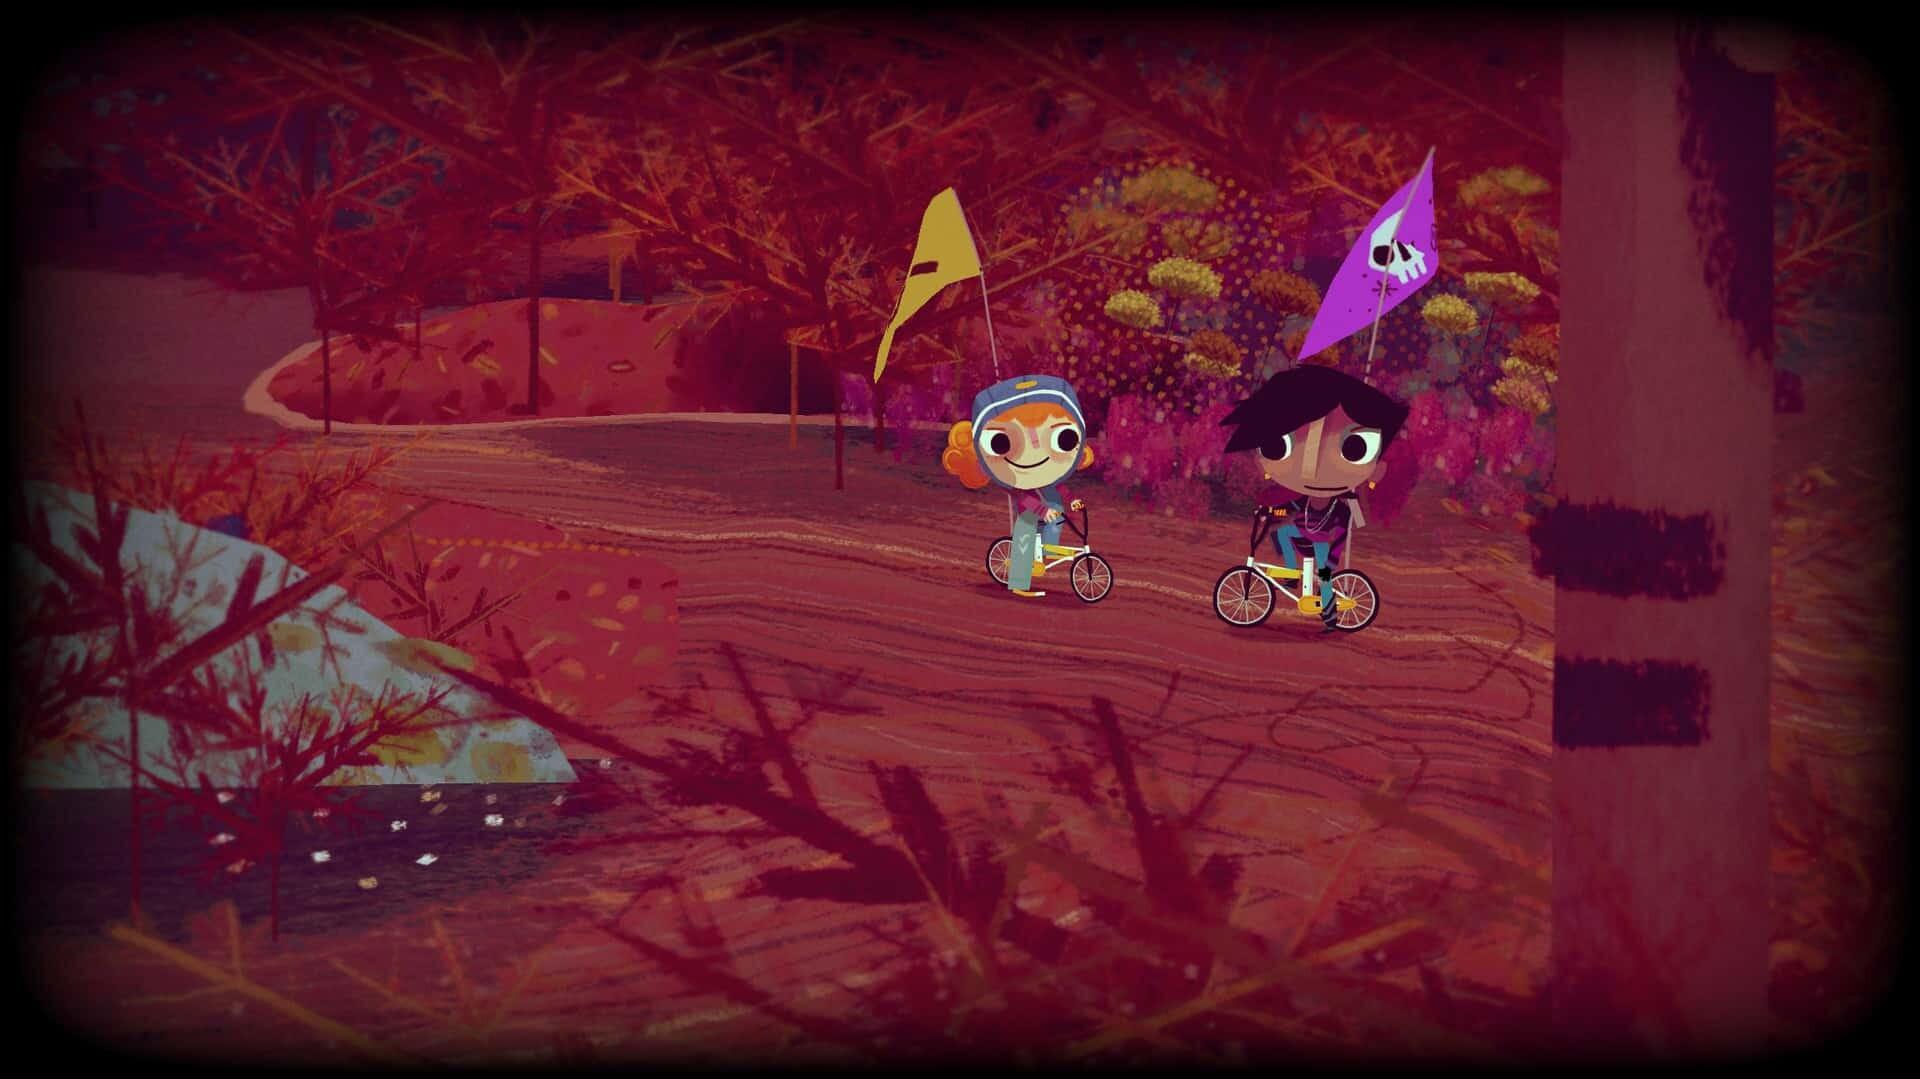 Knights and Bikes game screenshot courtesy Steam